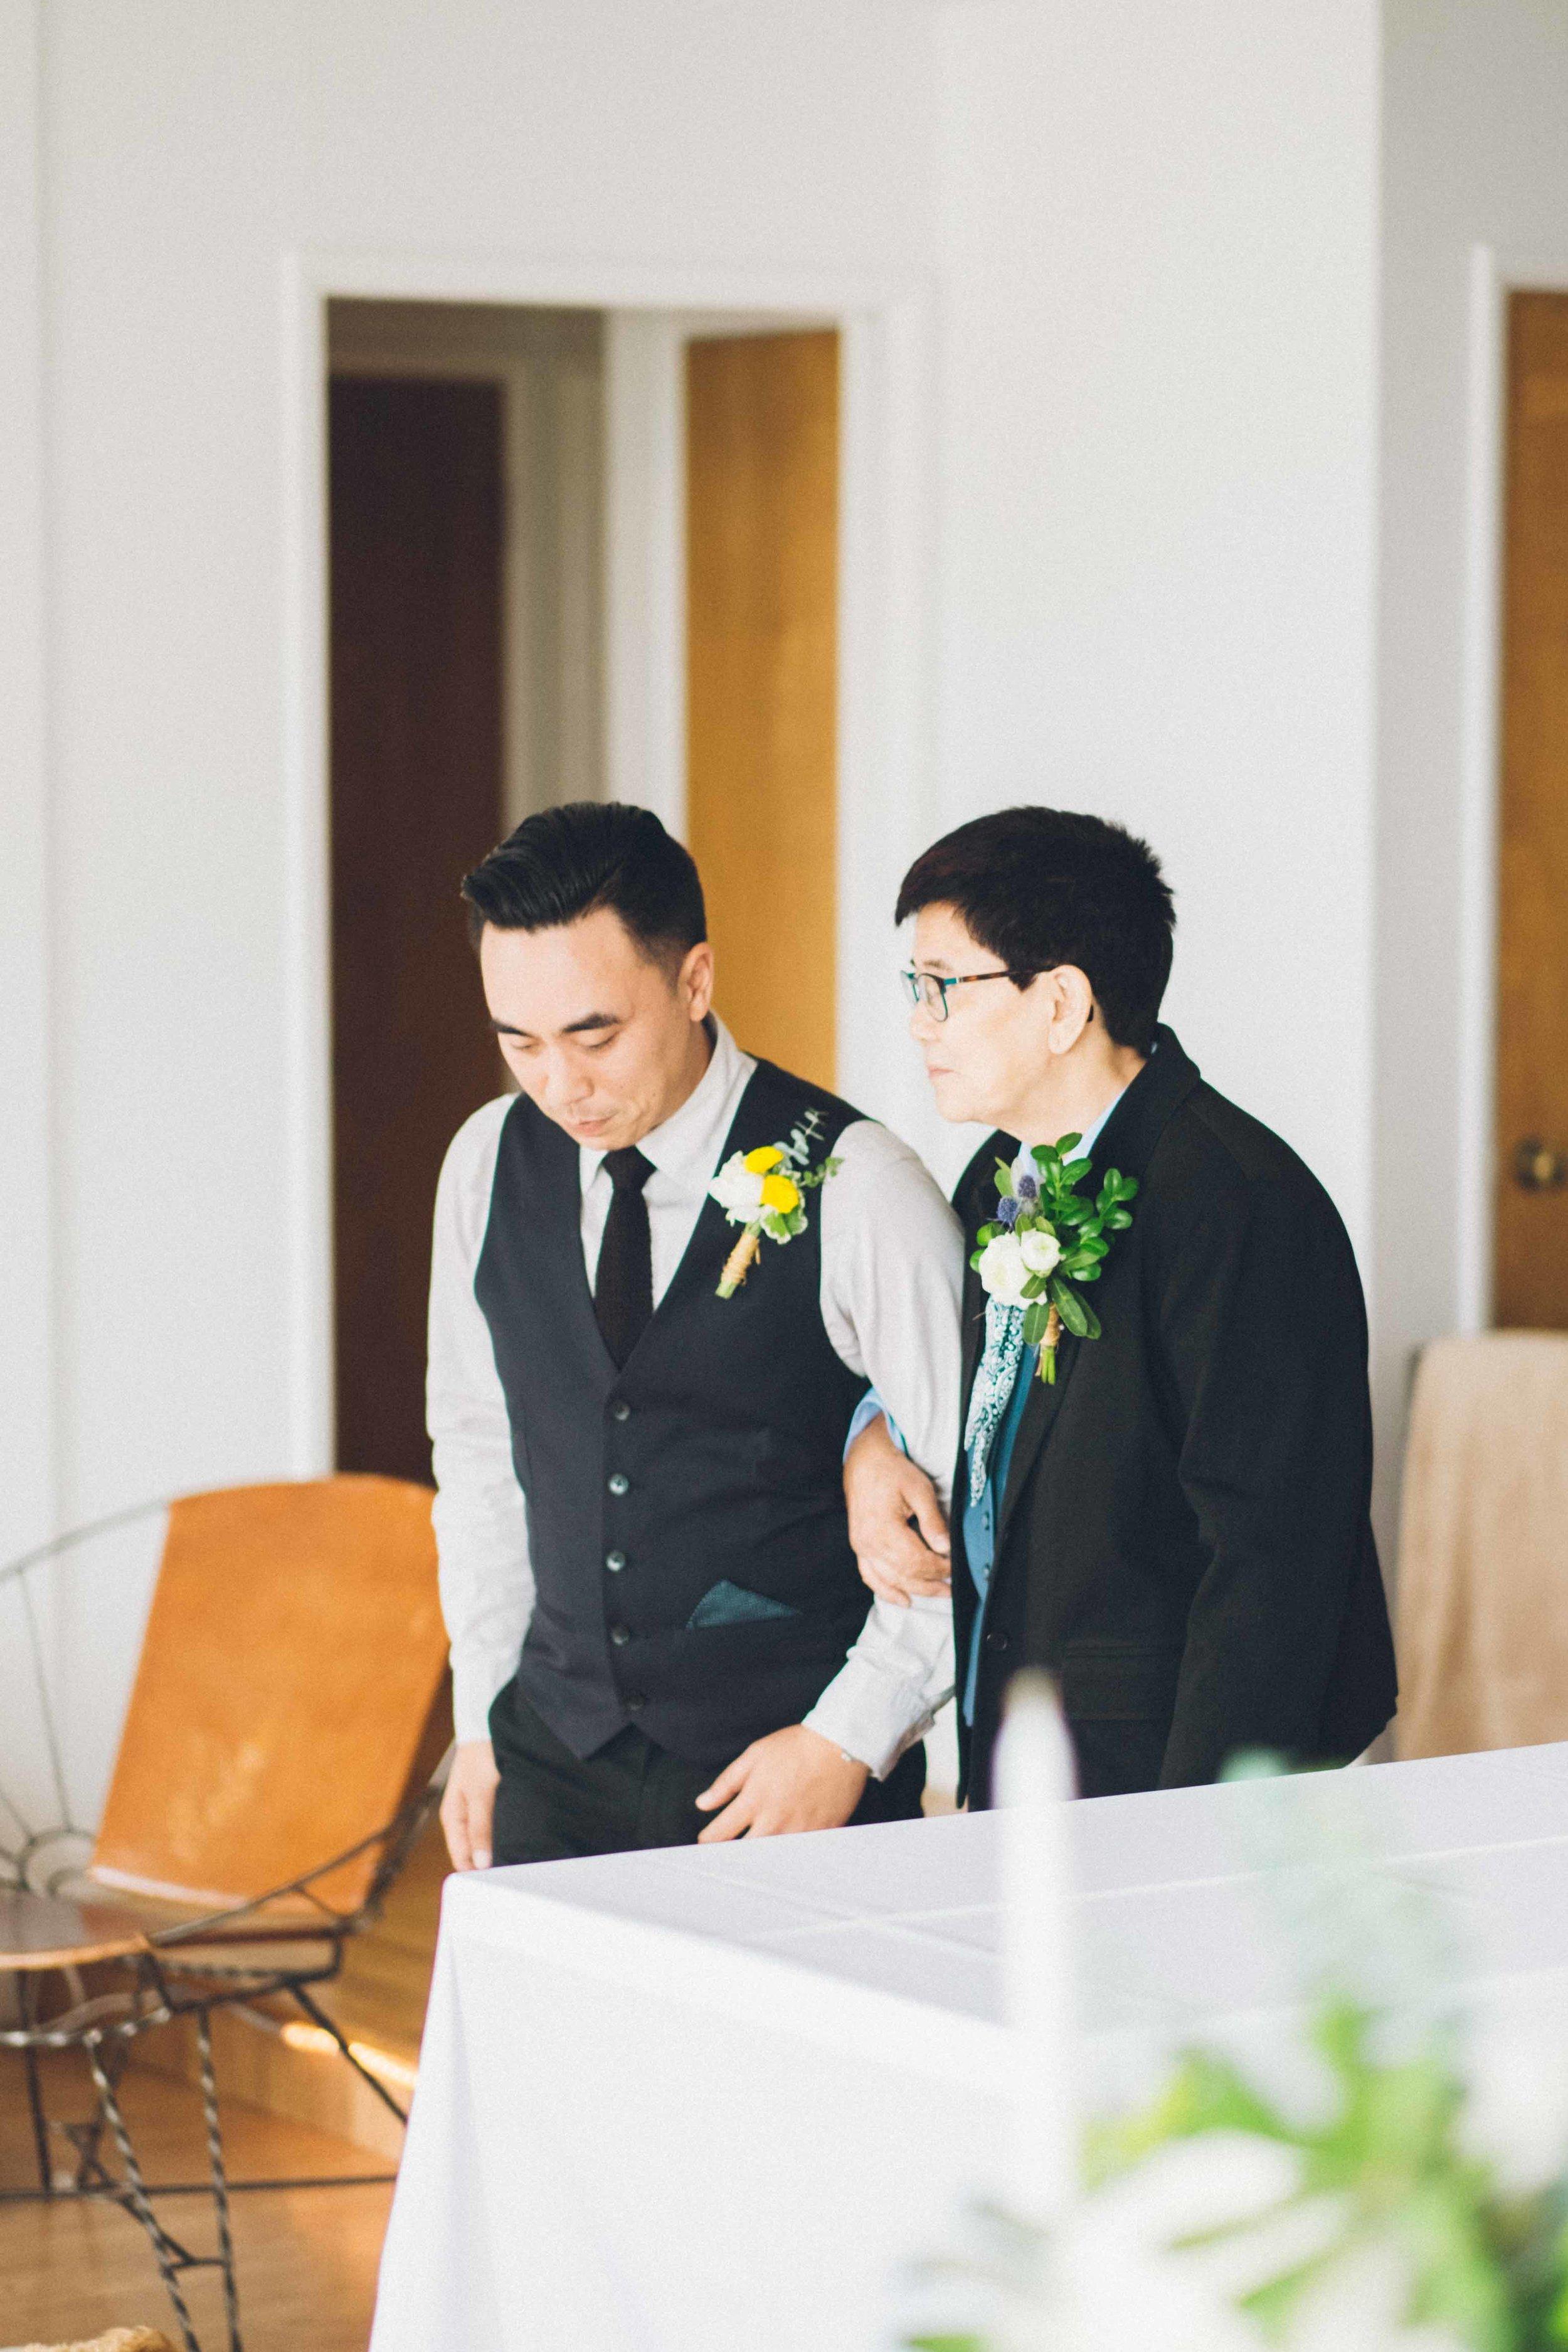 c-l-wedding-russell-rabanal-6515.jpg